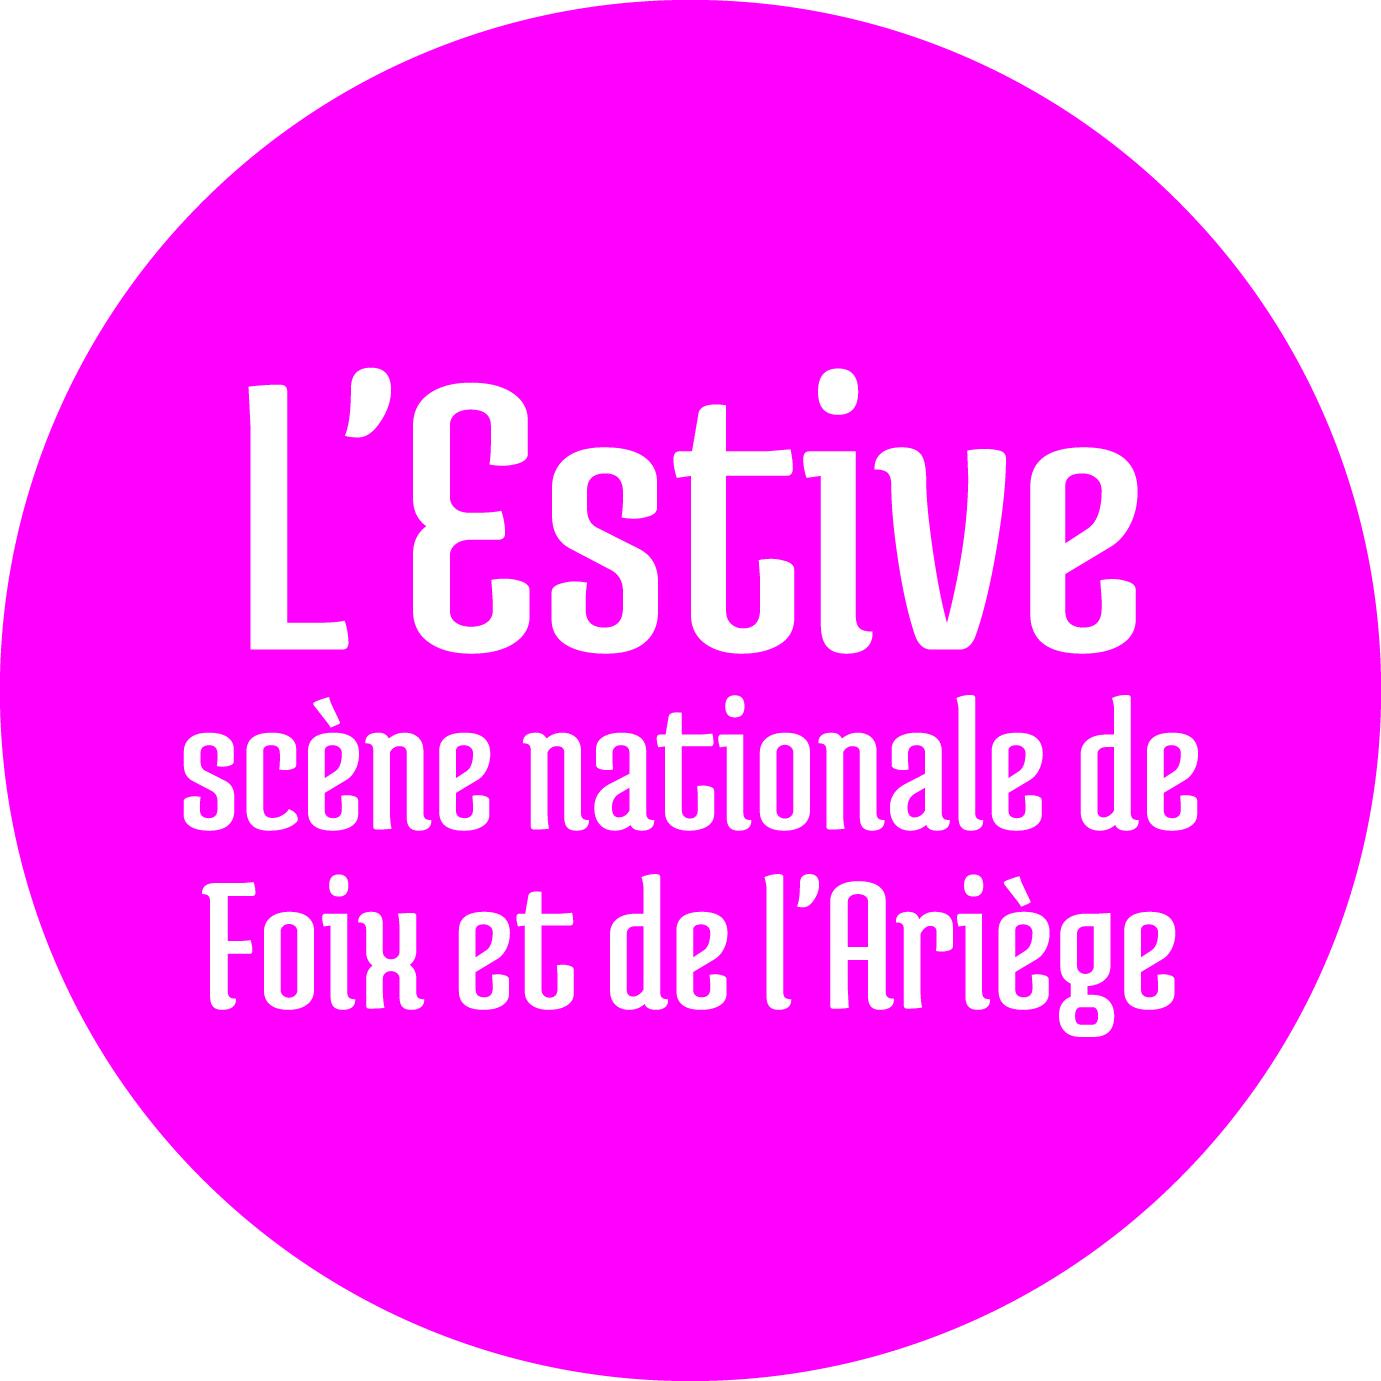 logo vectorise